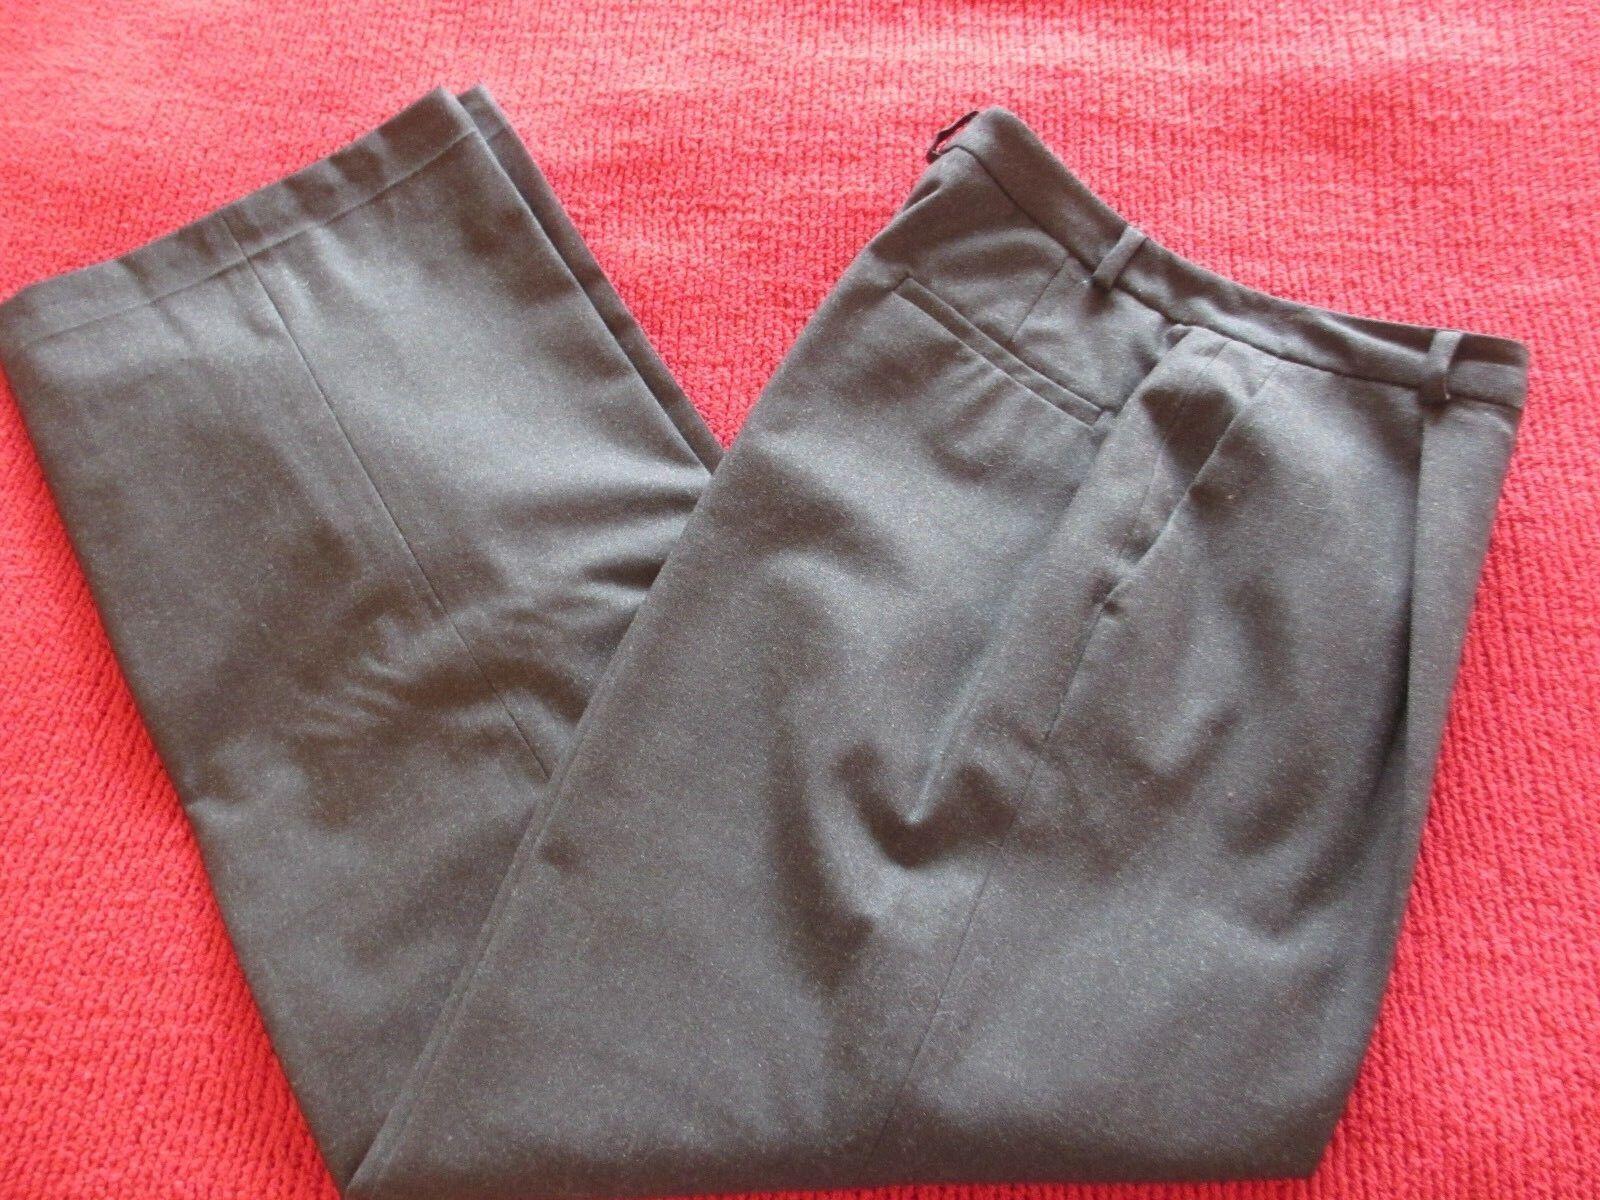 BROOKS BredHERS WOMEN'S DARK GREY PLEATED DRESS WOOL LYCRA PANTS SIZE 8